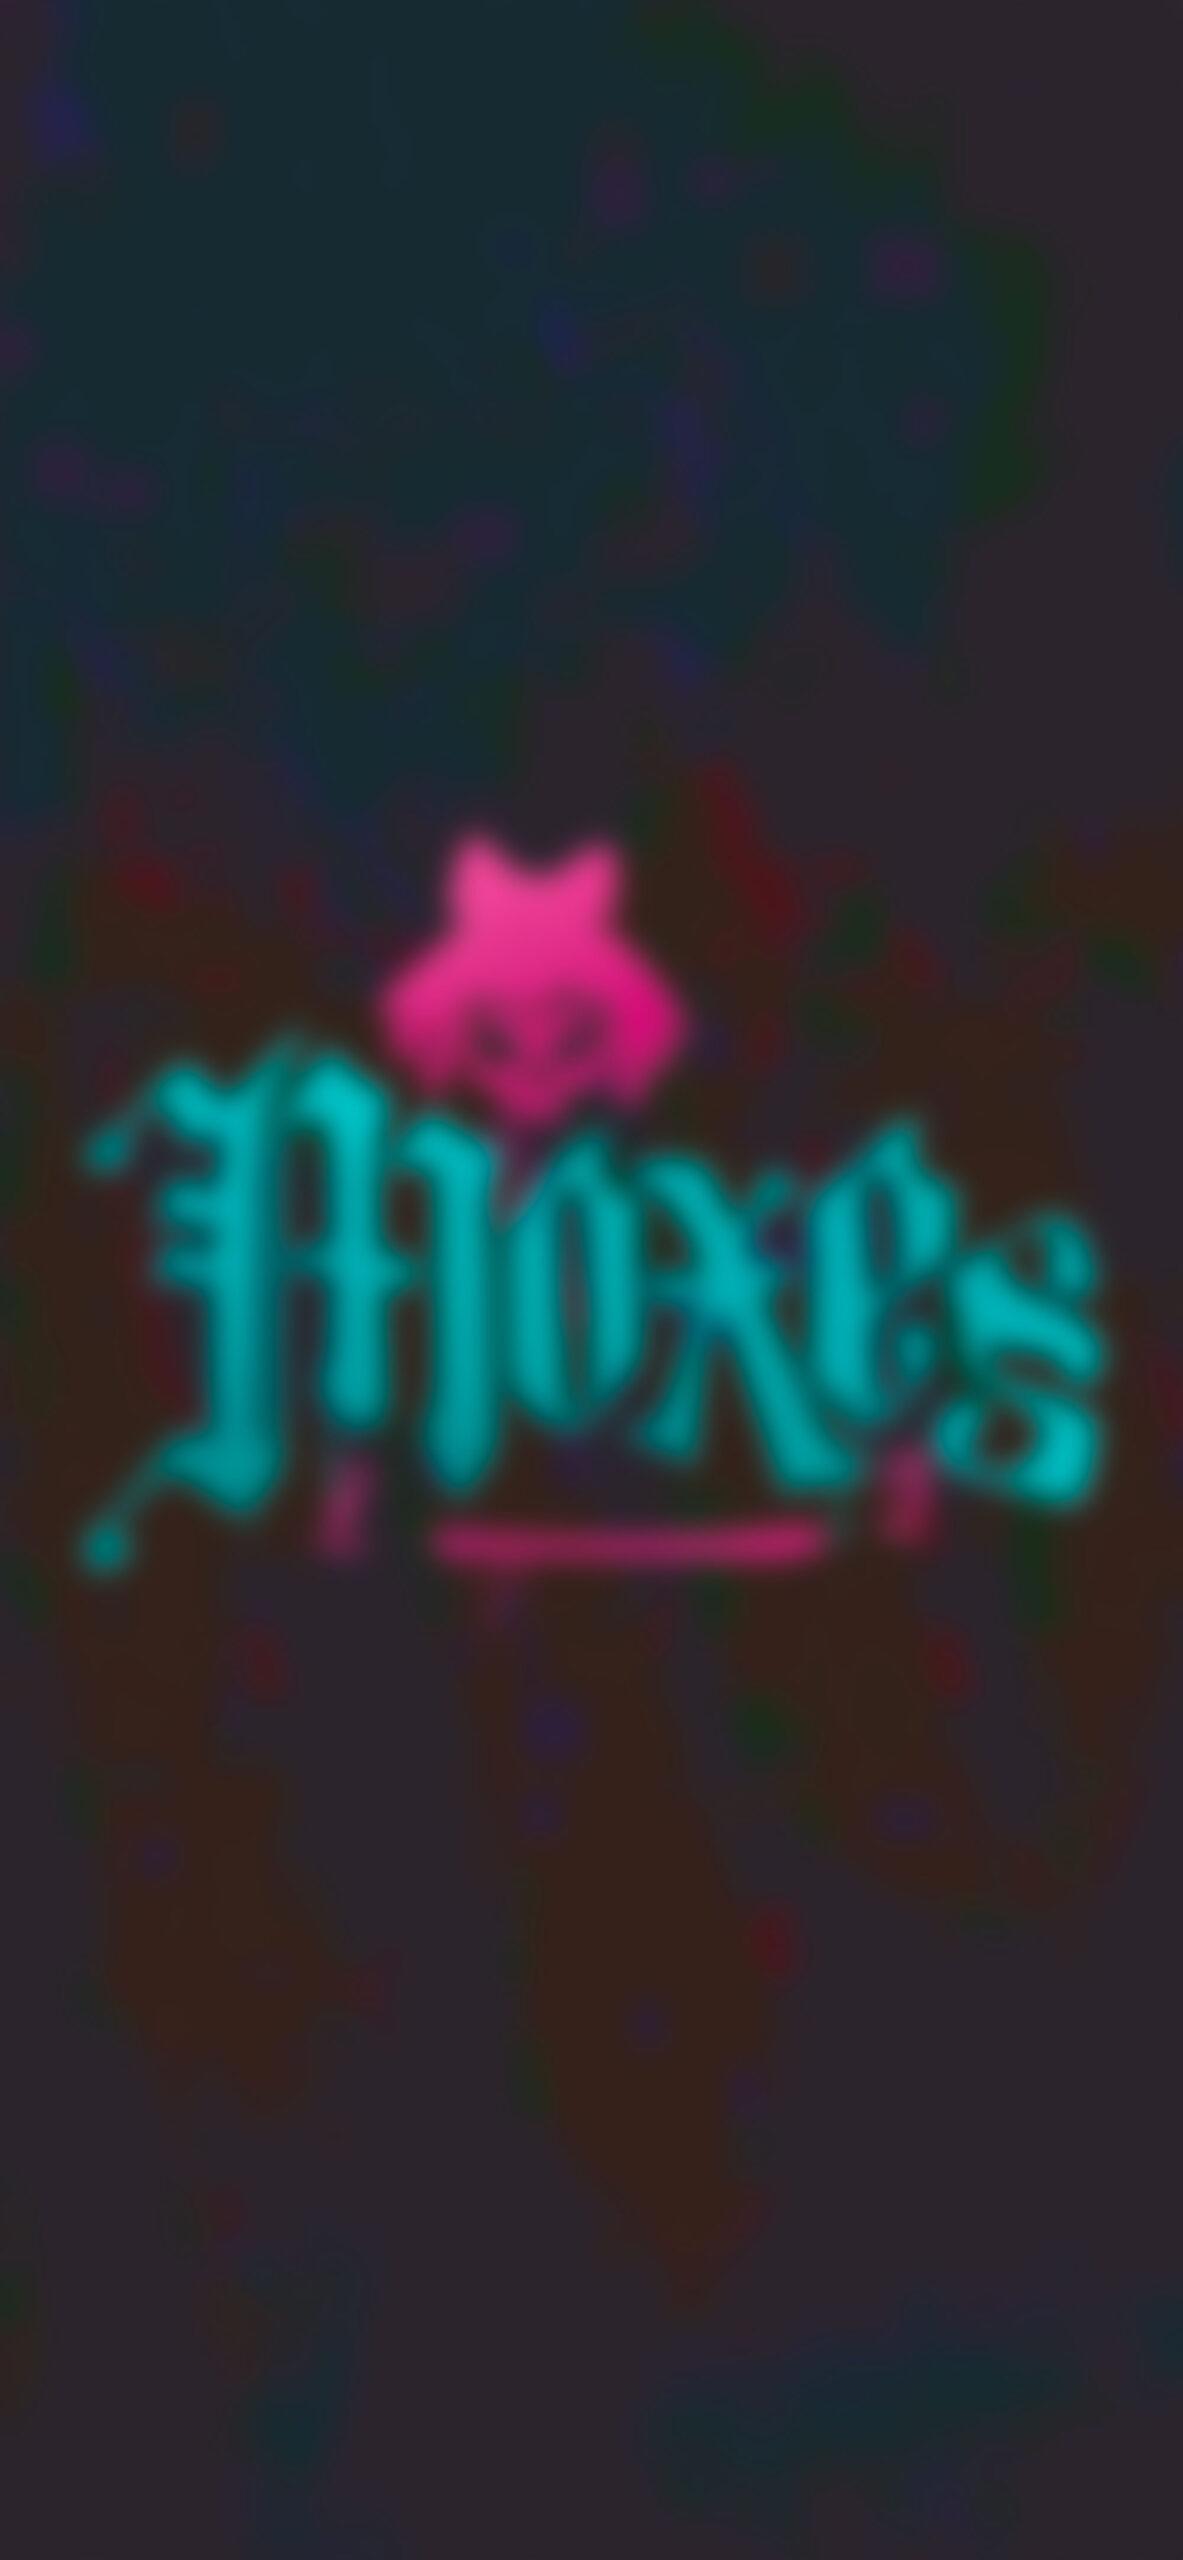 cyberpunk 2077 moxes logo glitch dark blur wallpaper